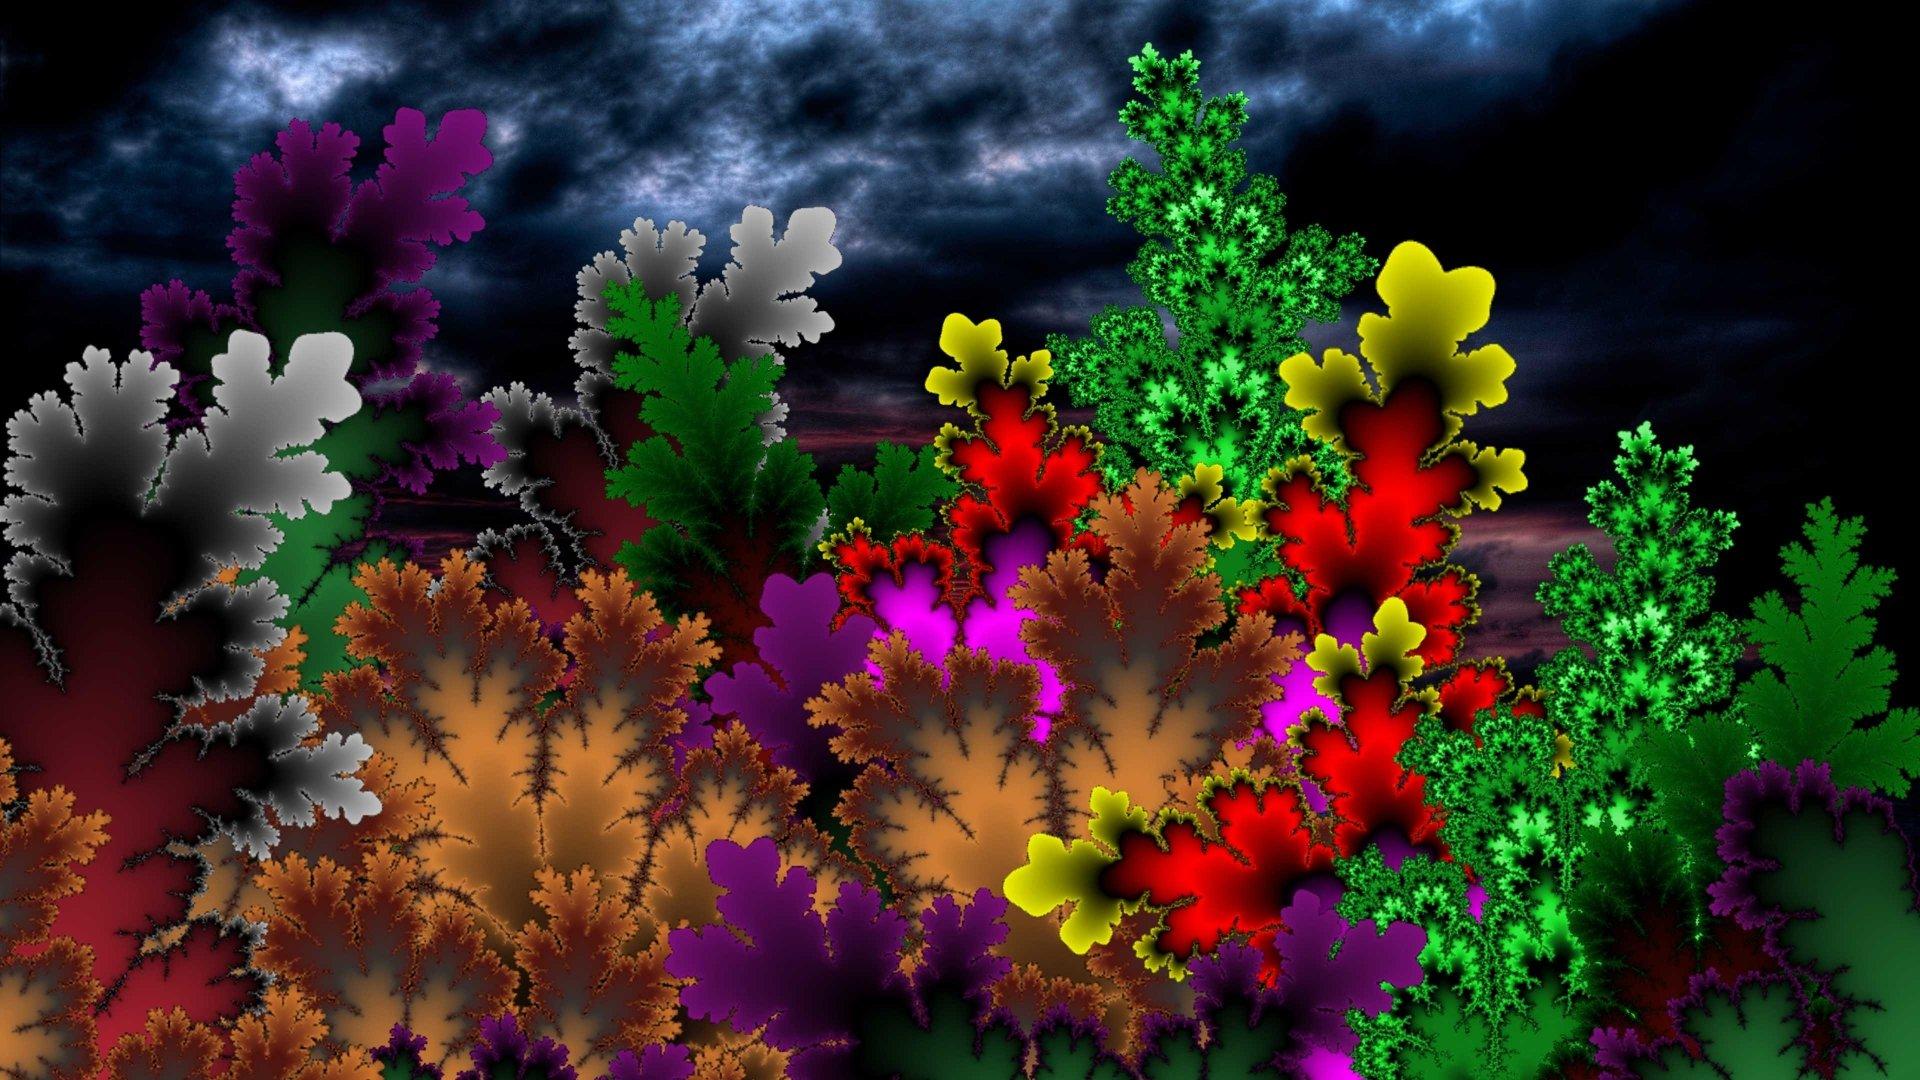 Abstract colorful leaves 4k ultra hd wallpaper - Desktop wallpaper 4k ultra hd ...